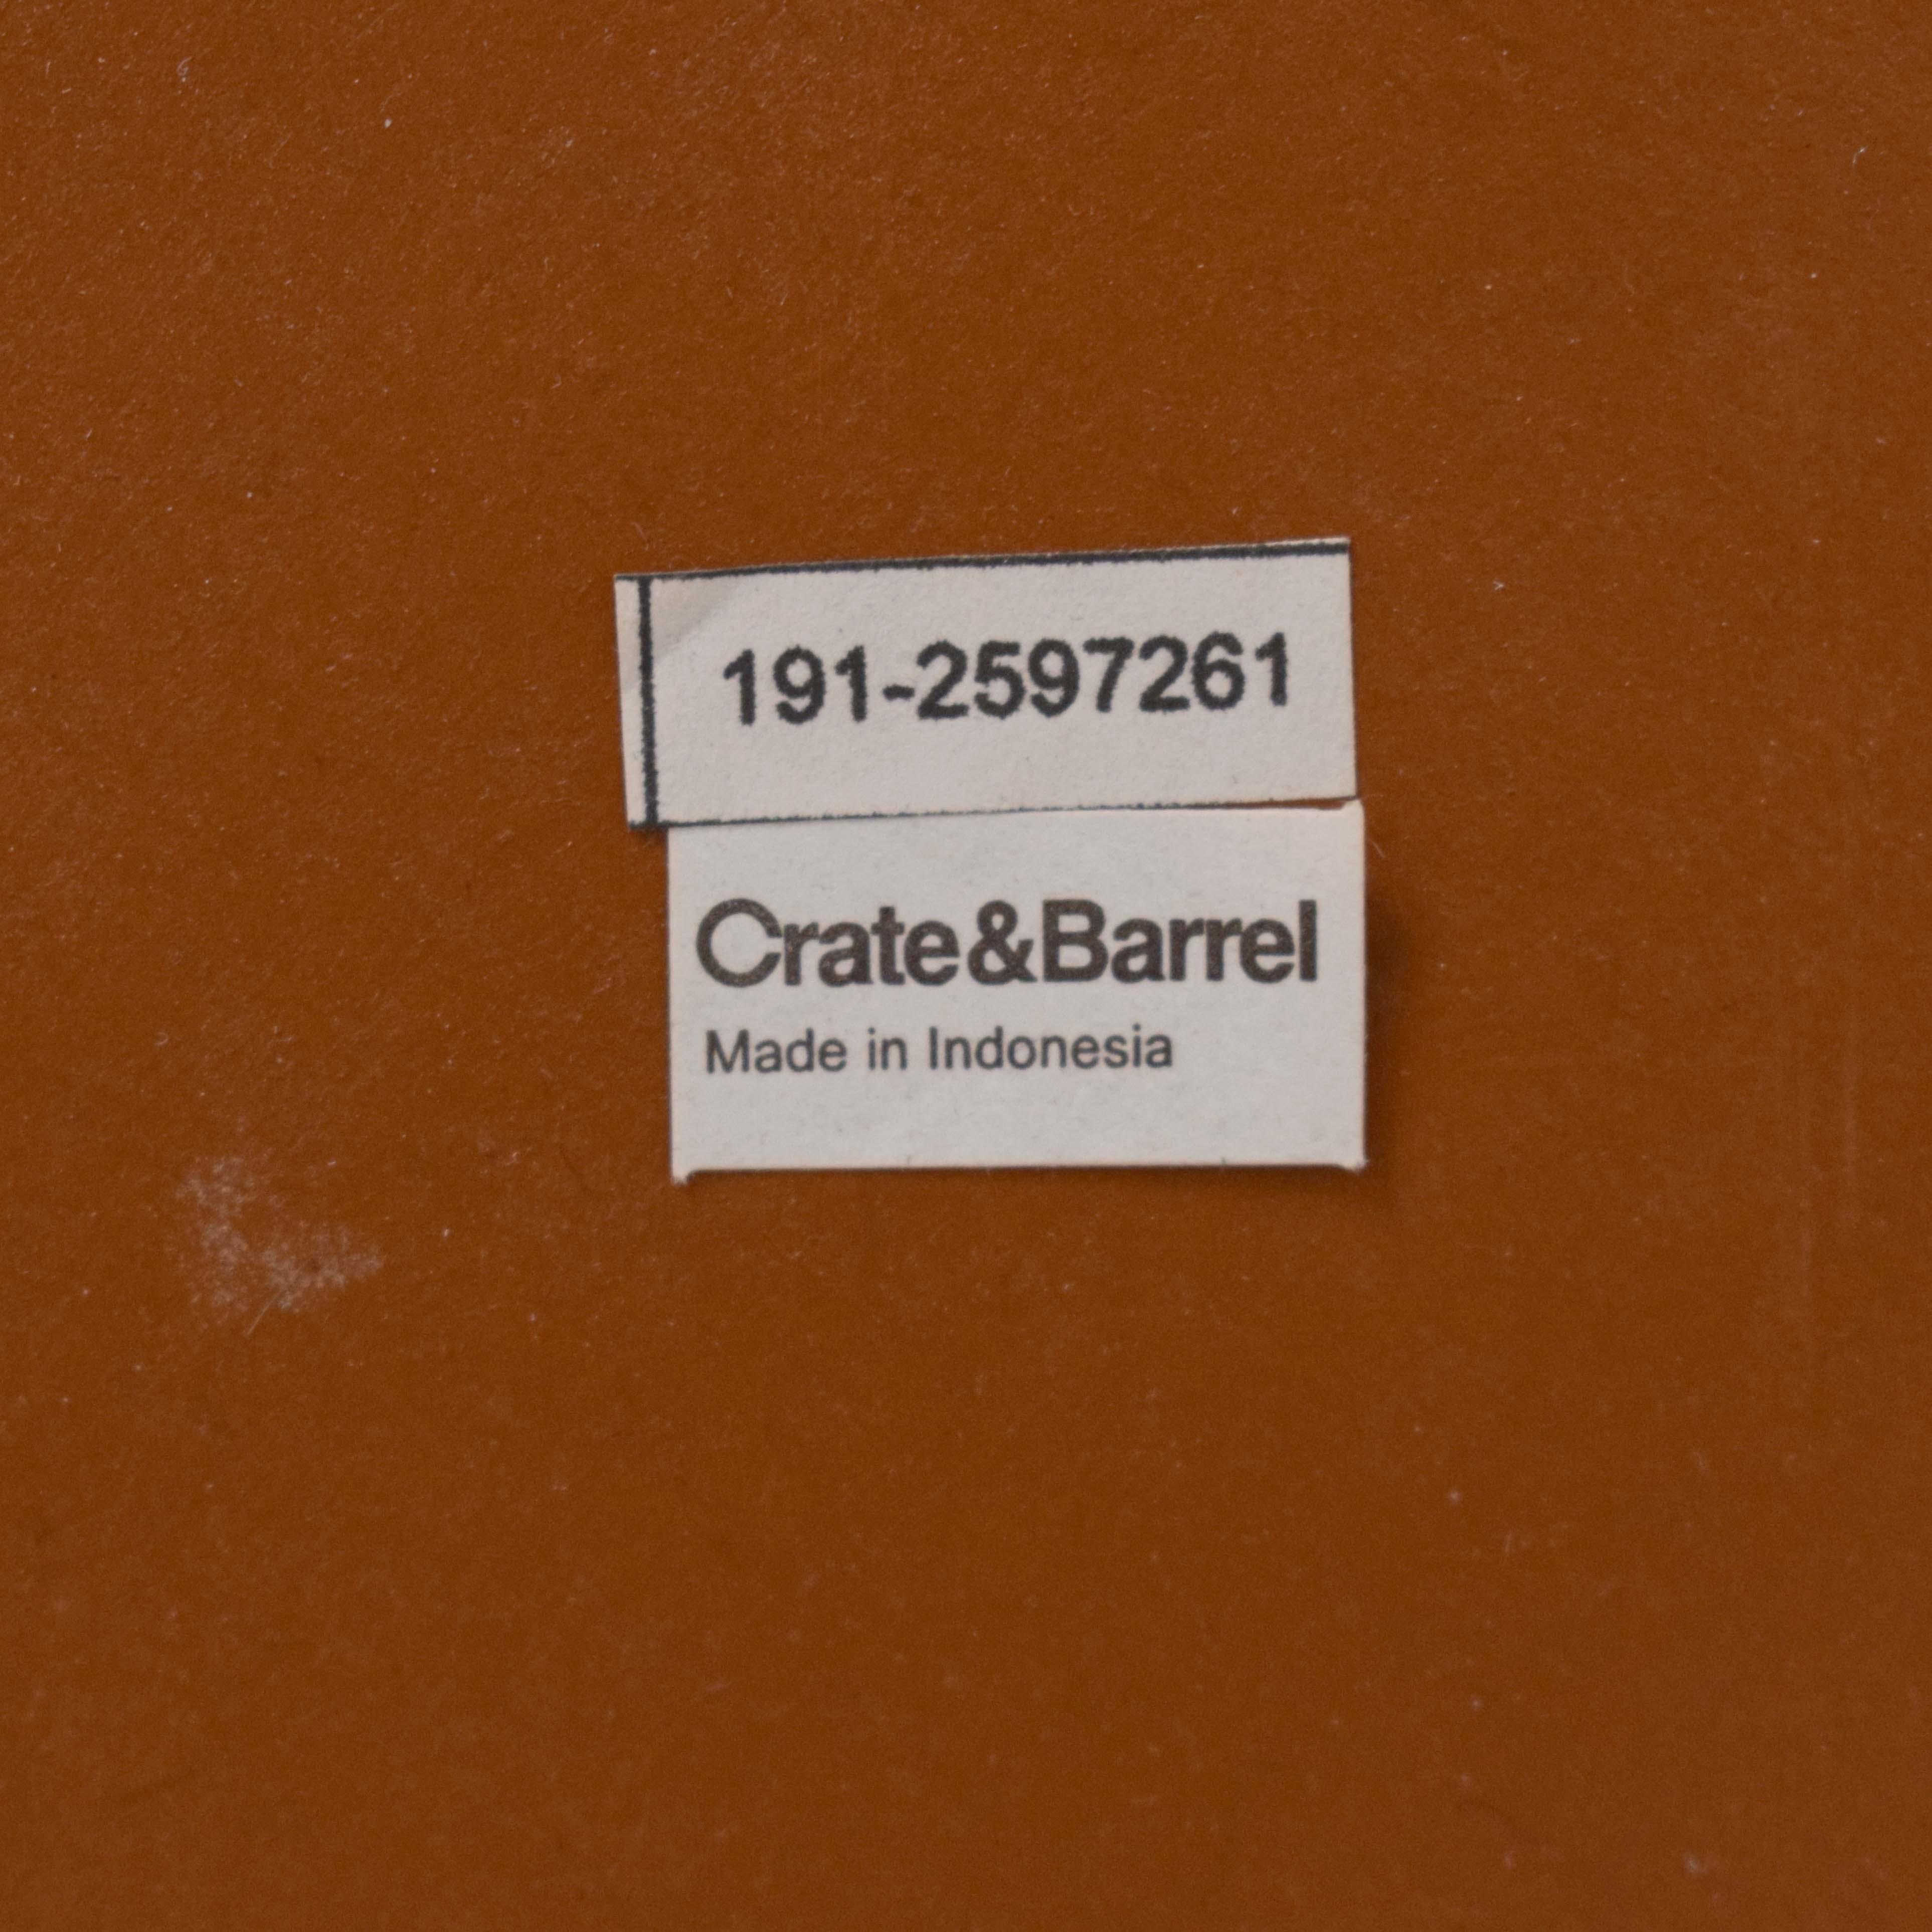 Crate & Barrel Crate & Barrel Tambe Coffee Table ma